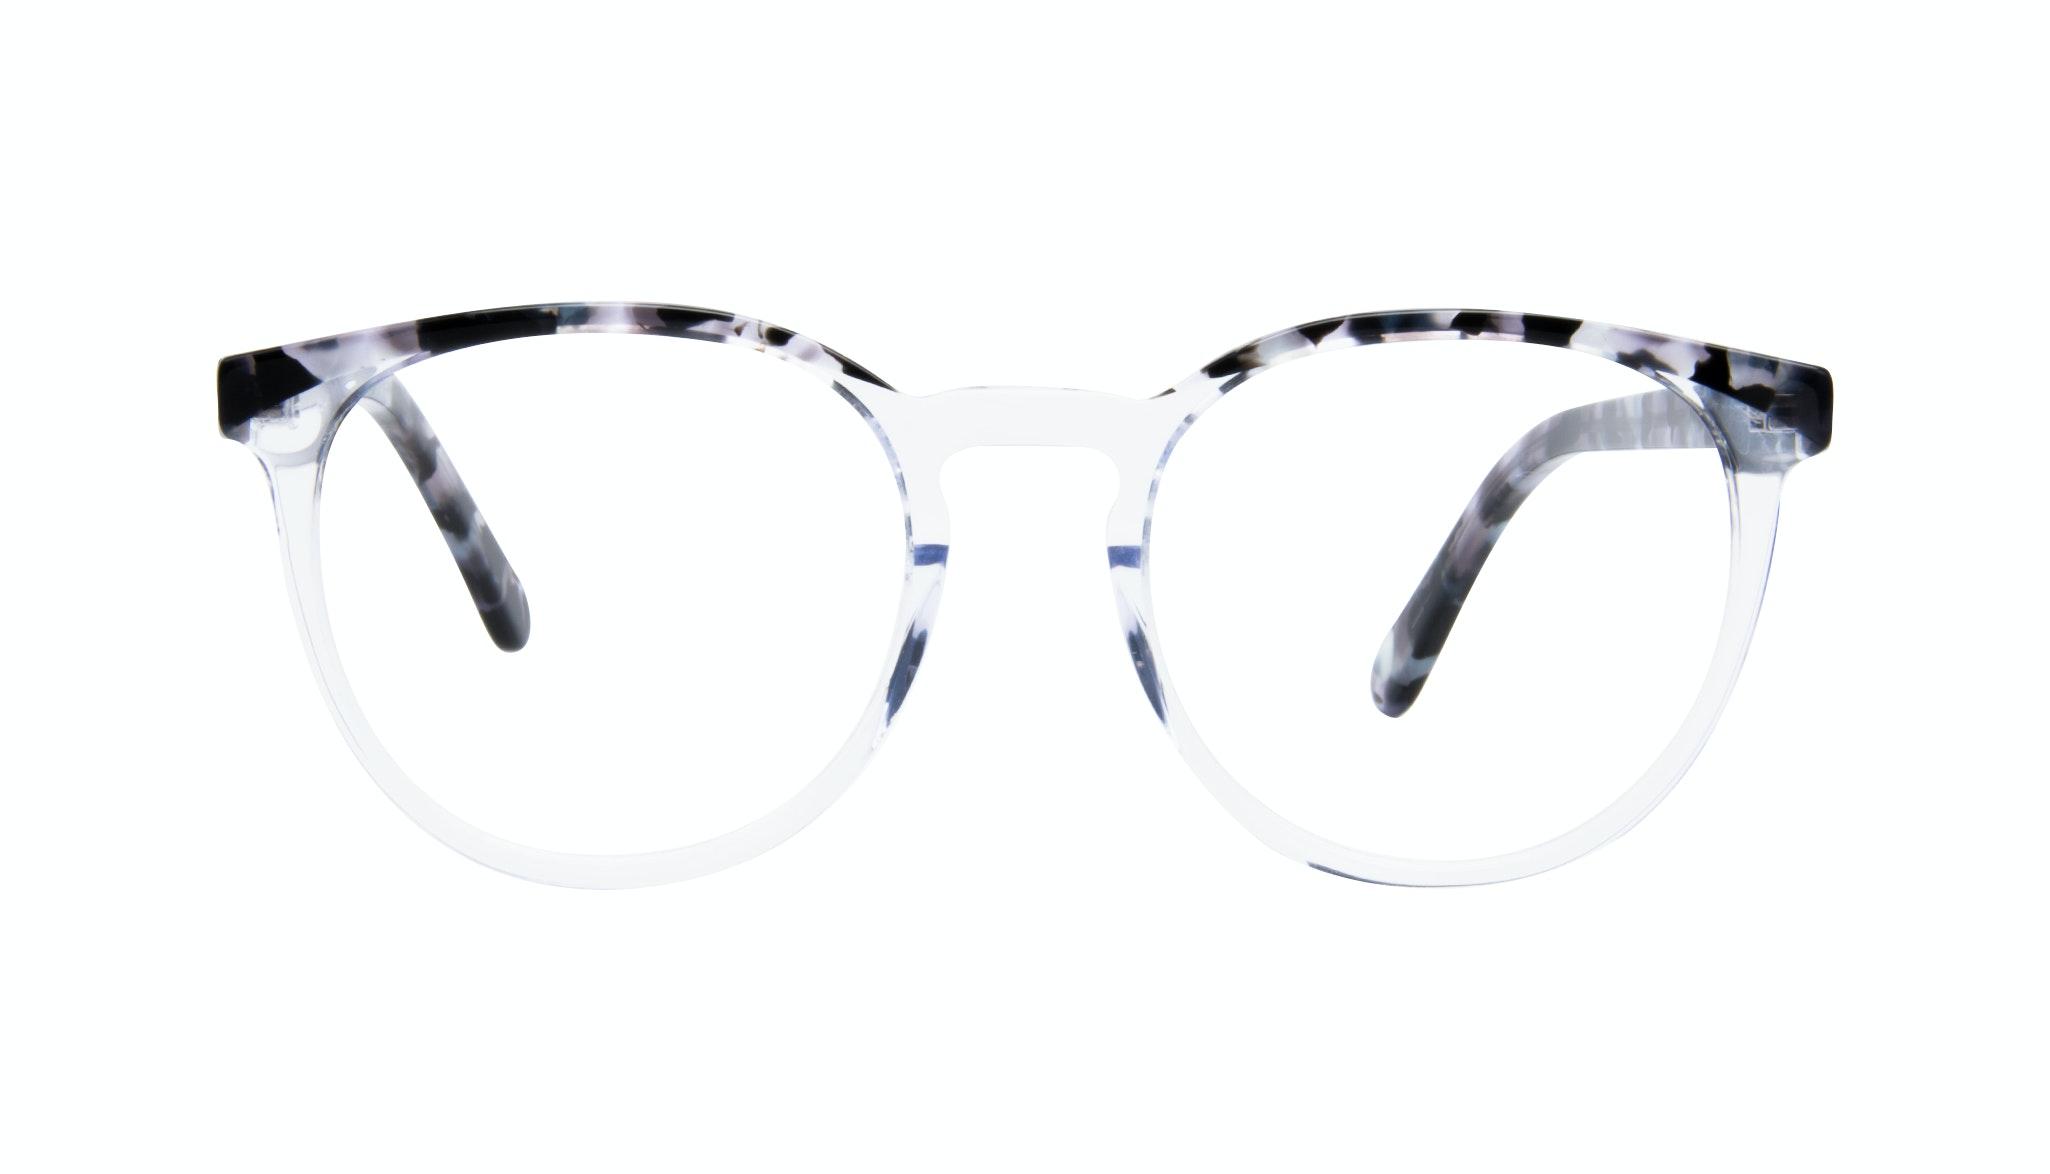 Affordable Fashion Glasses Round Eyeglasses Women Brilliant Cloud Front